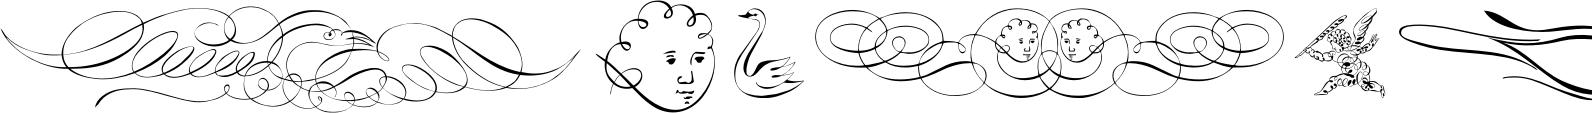 Calligraphia Latina Soft Four